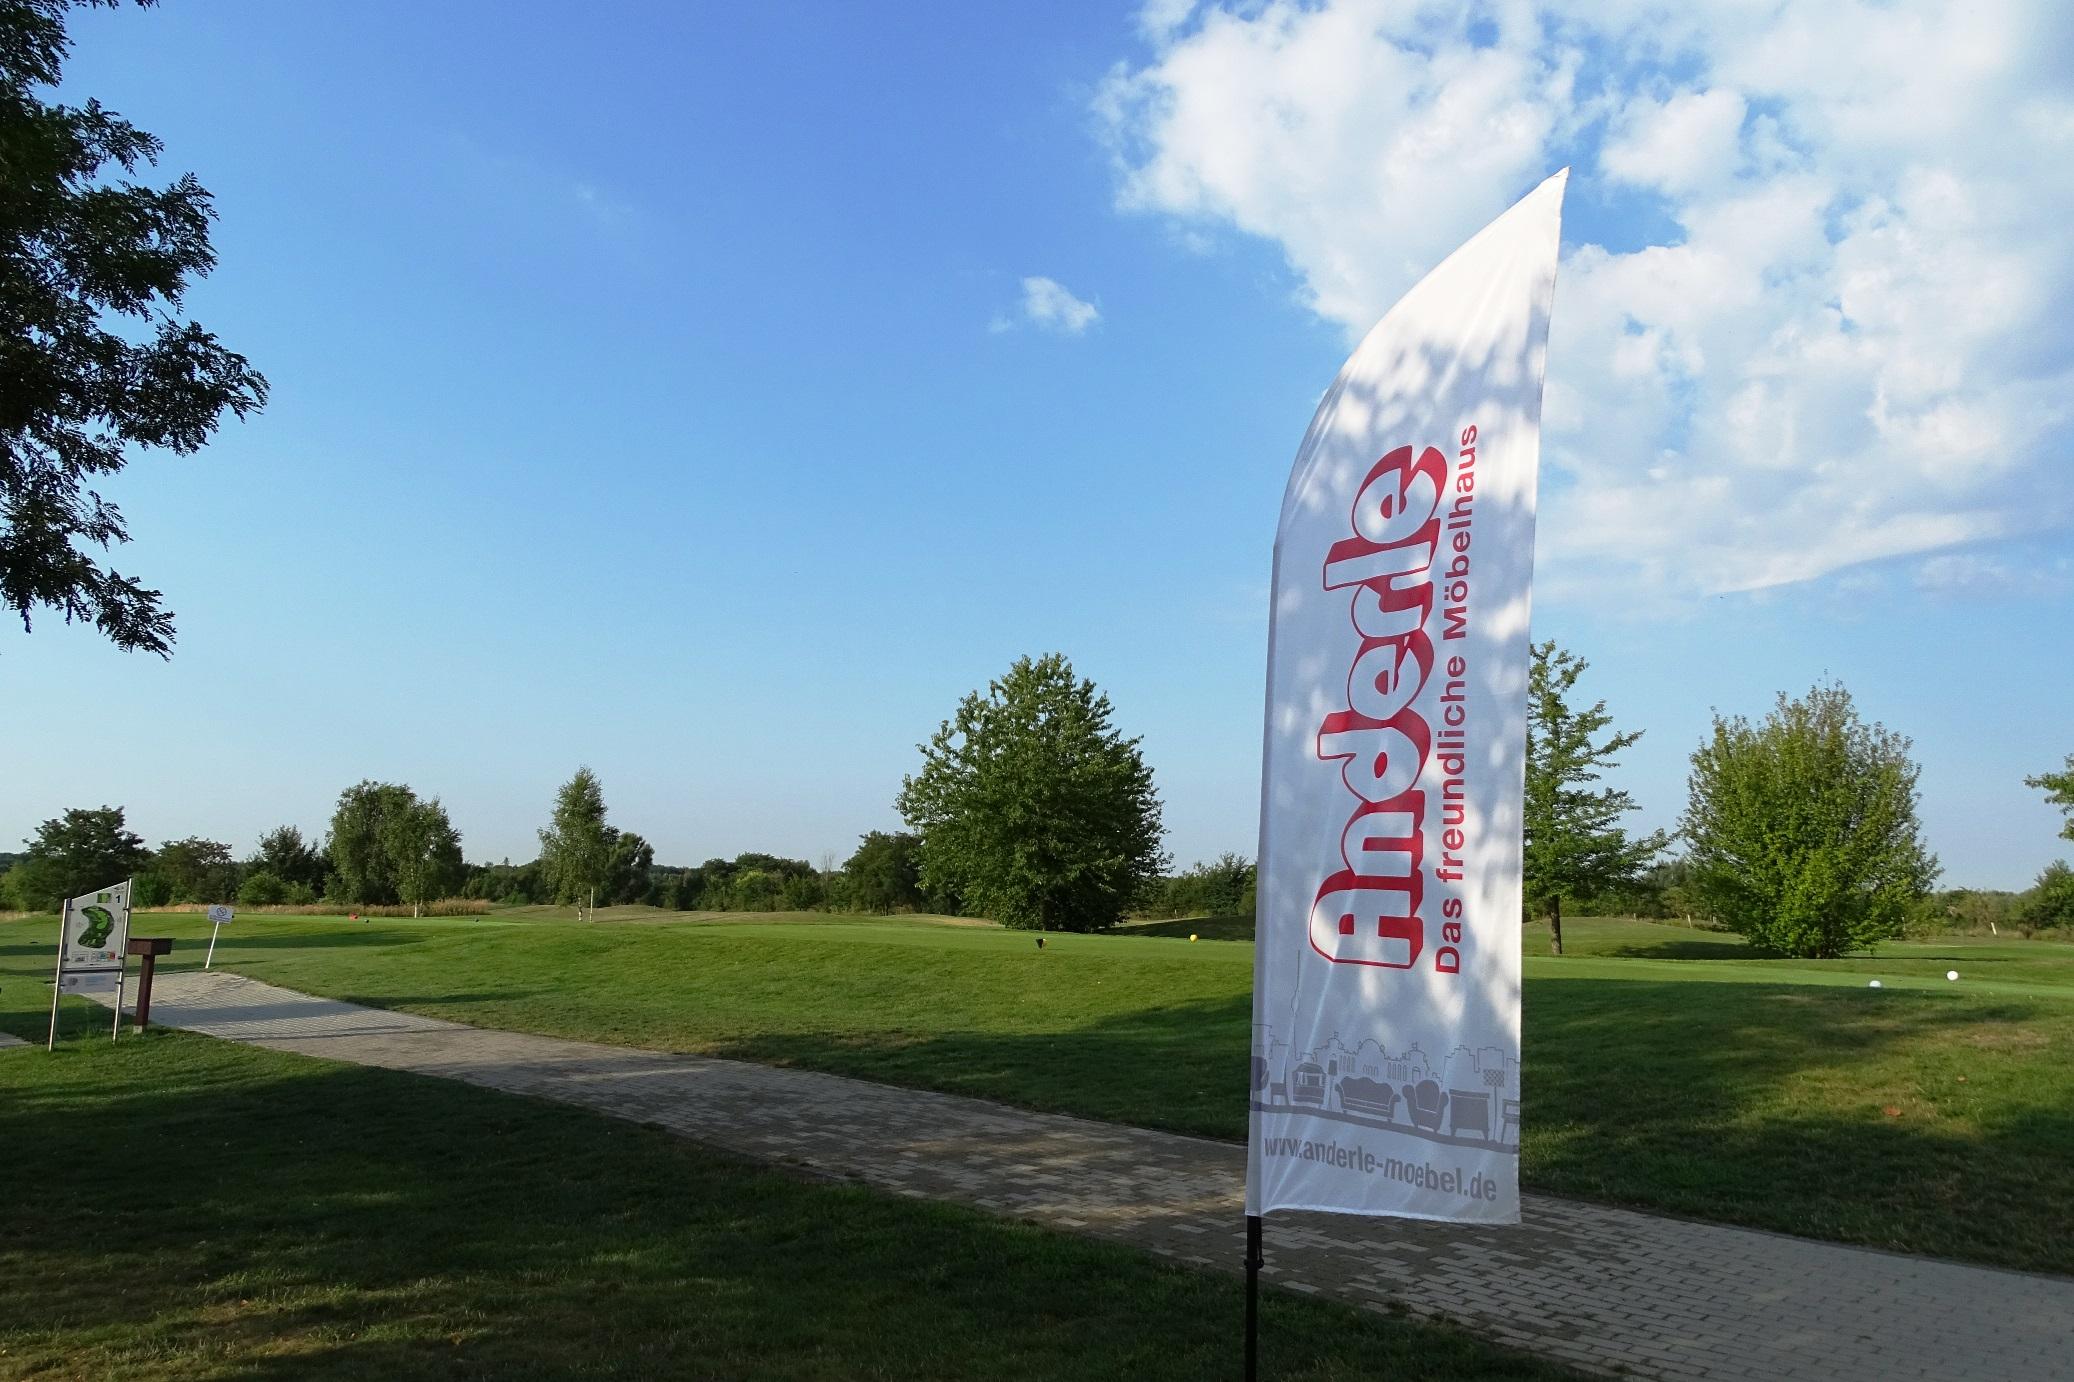 Pink Ist Trumpf Berliner Golfclub Stolper Heide